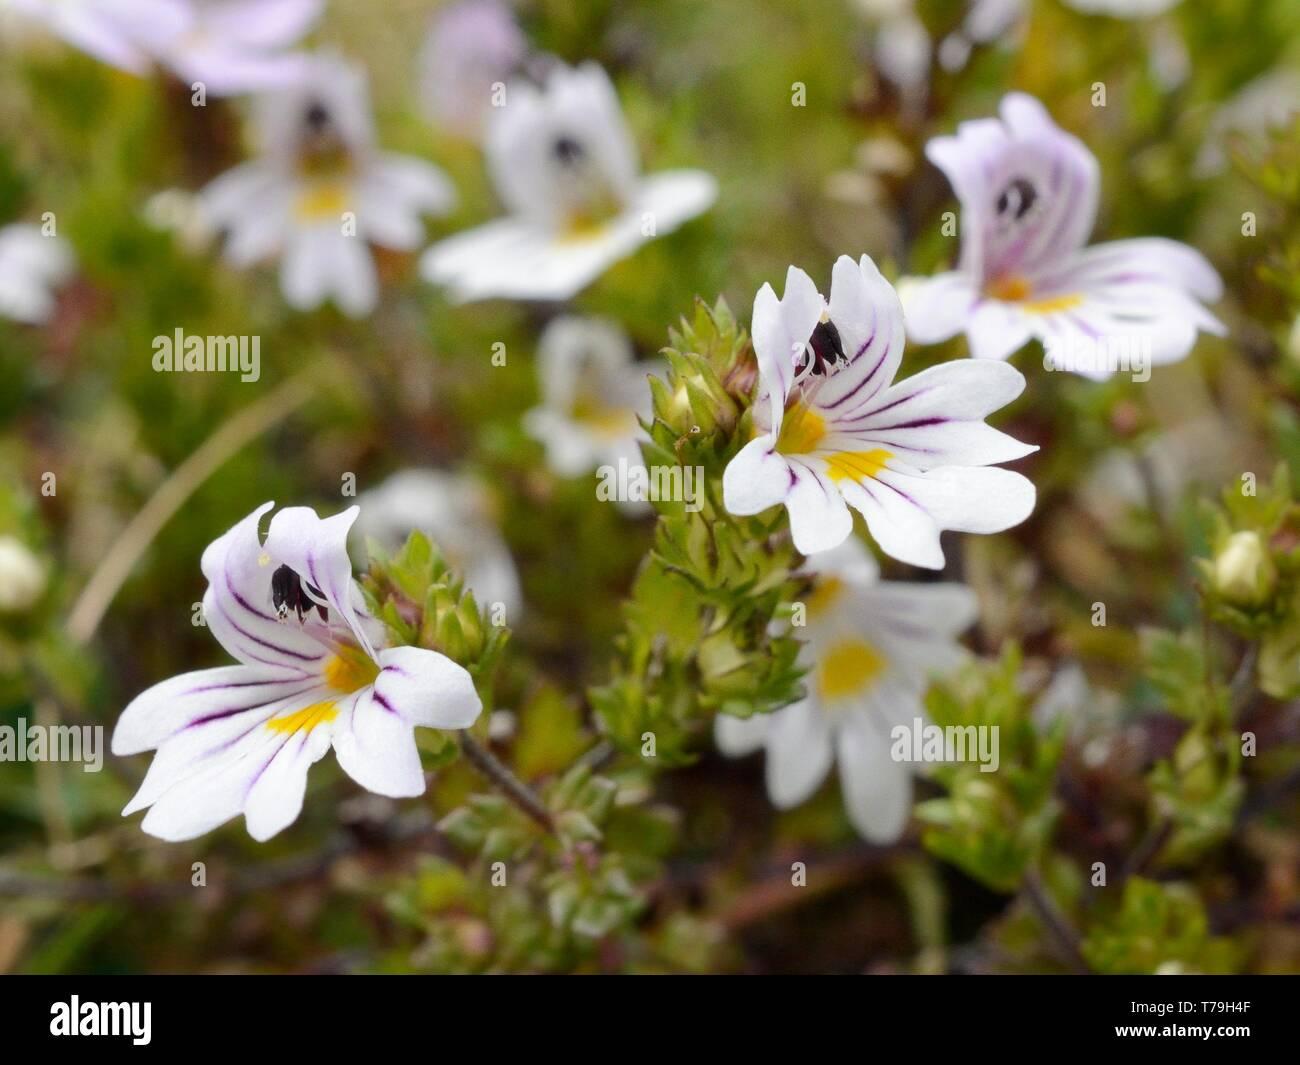 Alpine Augentrost (Euphrasia alpina) blühen auf montane Weiden, Covadonga, Picos de Europa, Asturien, Spanien, August. Stockbild